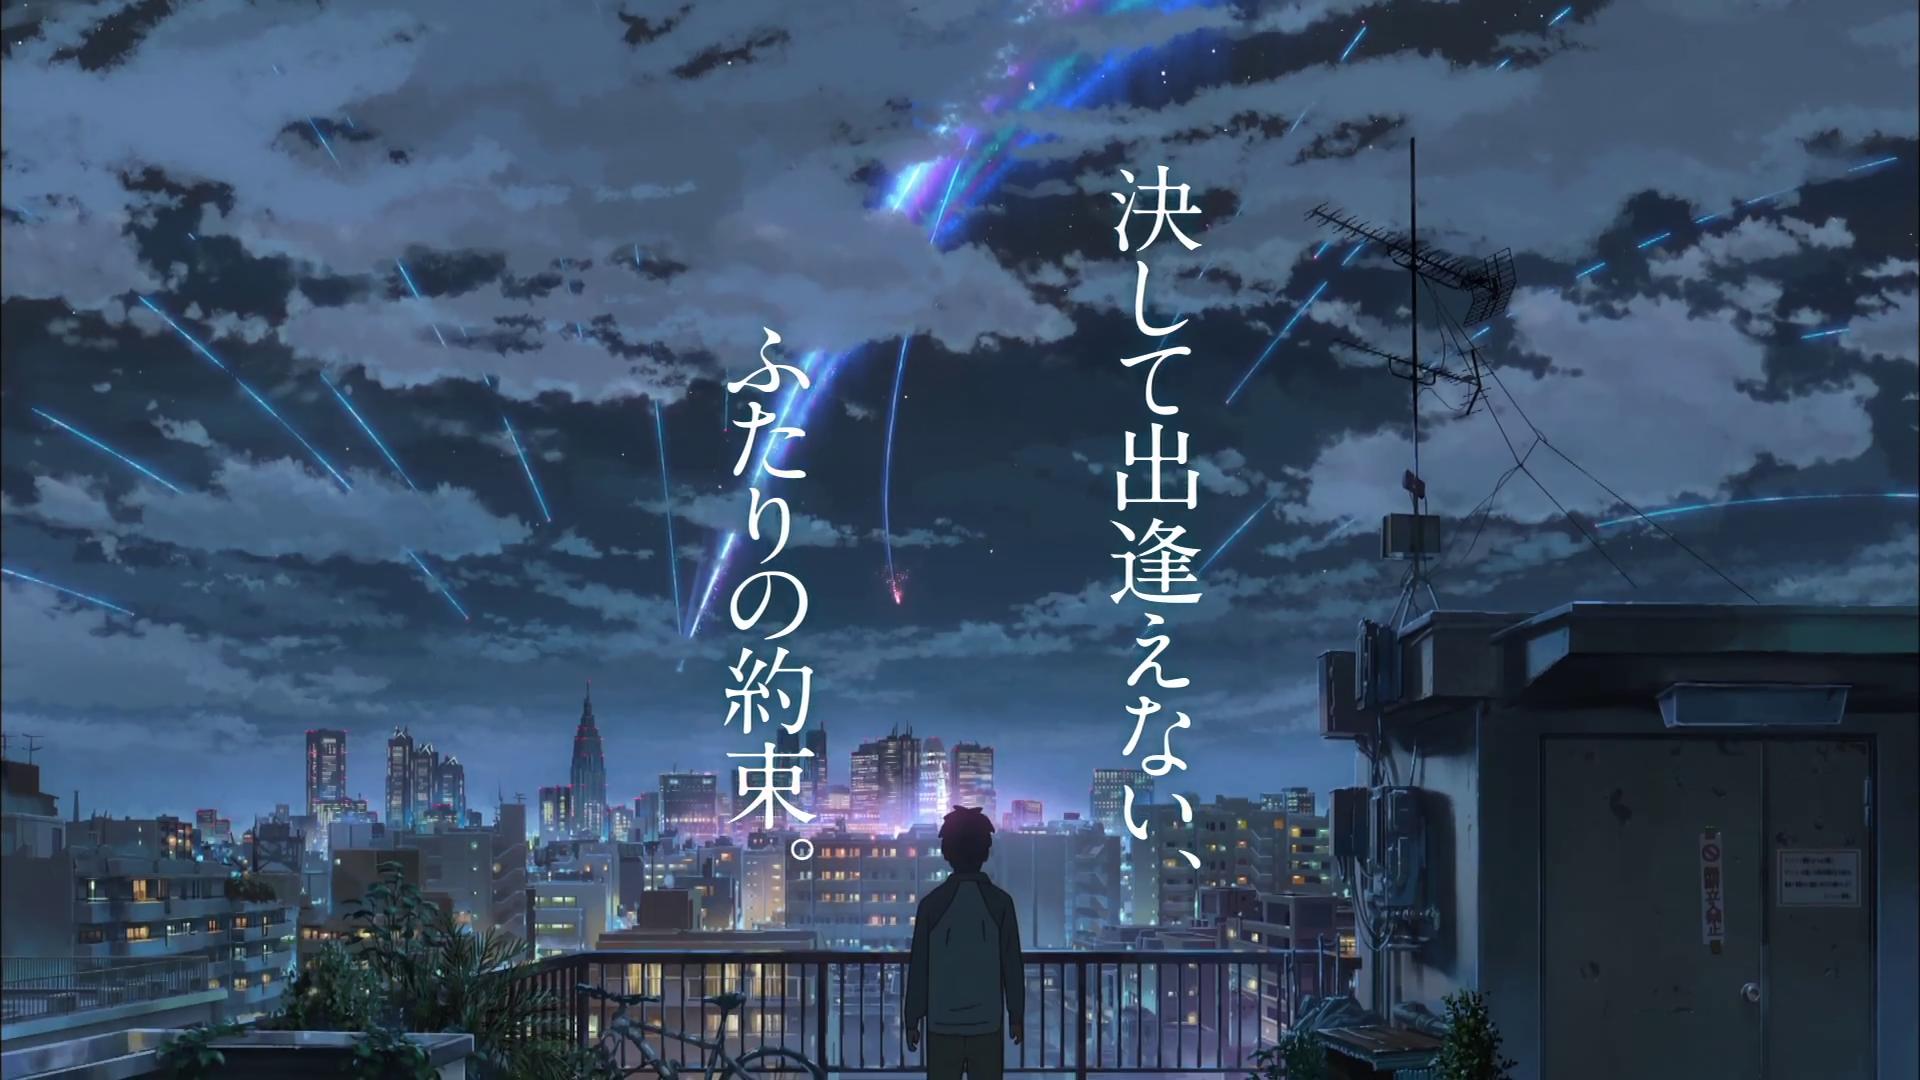 Anime Your Name Kimi No Na Wa Taki Tachibana Fond D Ecran Kimi No Na Wa Fond D Ecran Ordi Fond Ecran Hd Pc